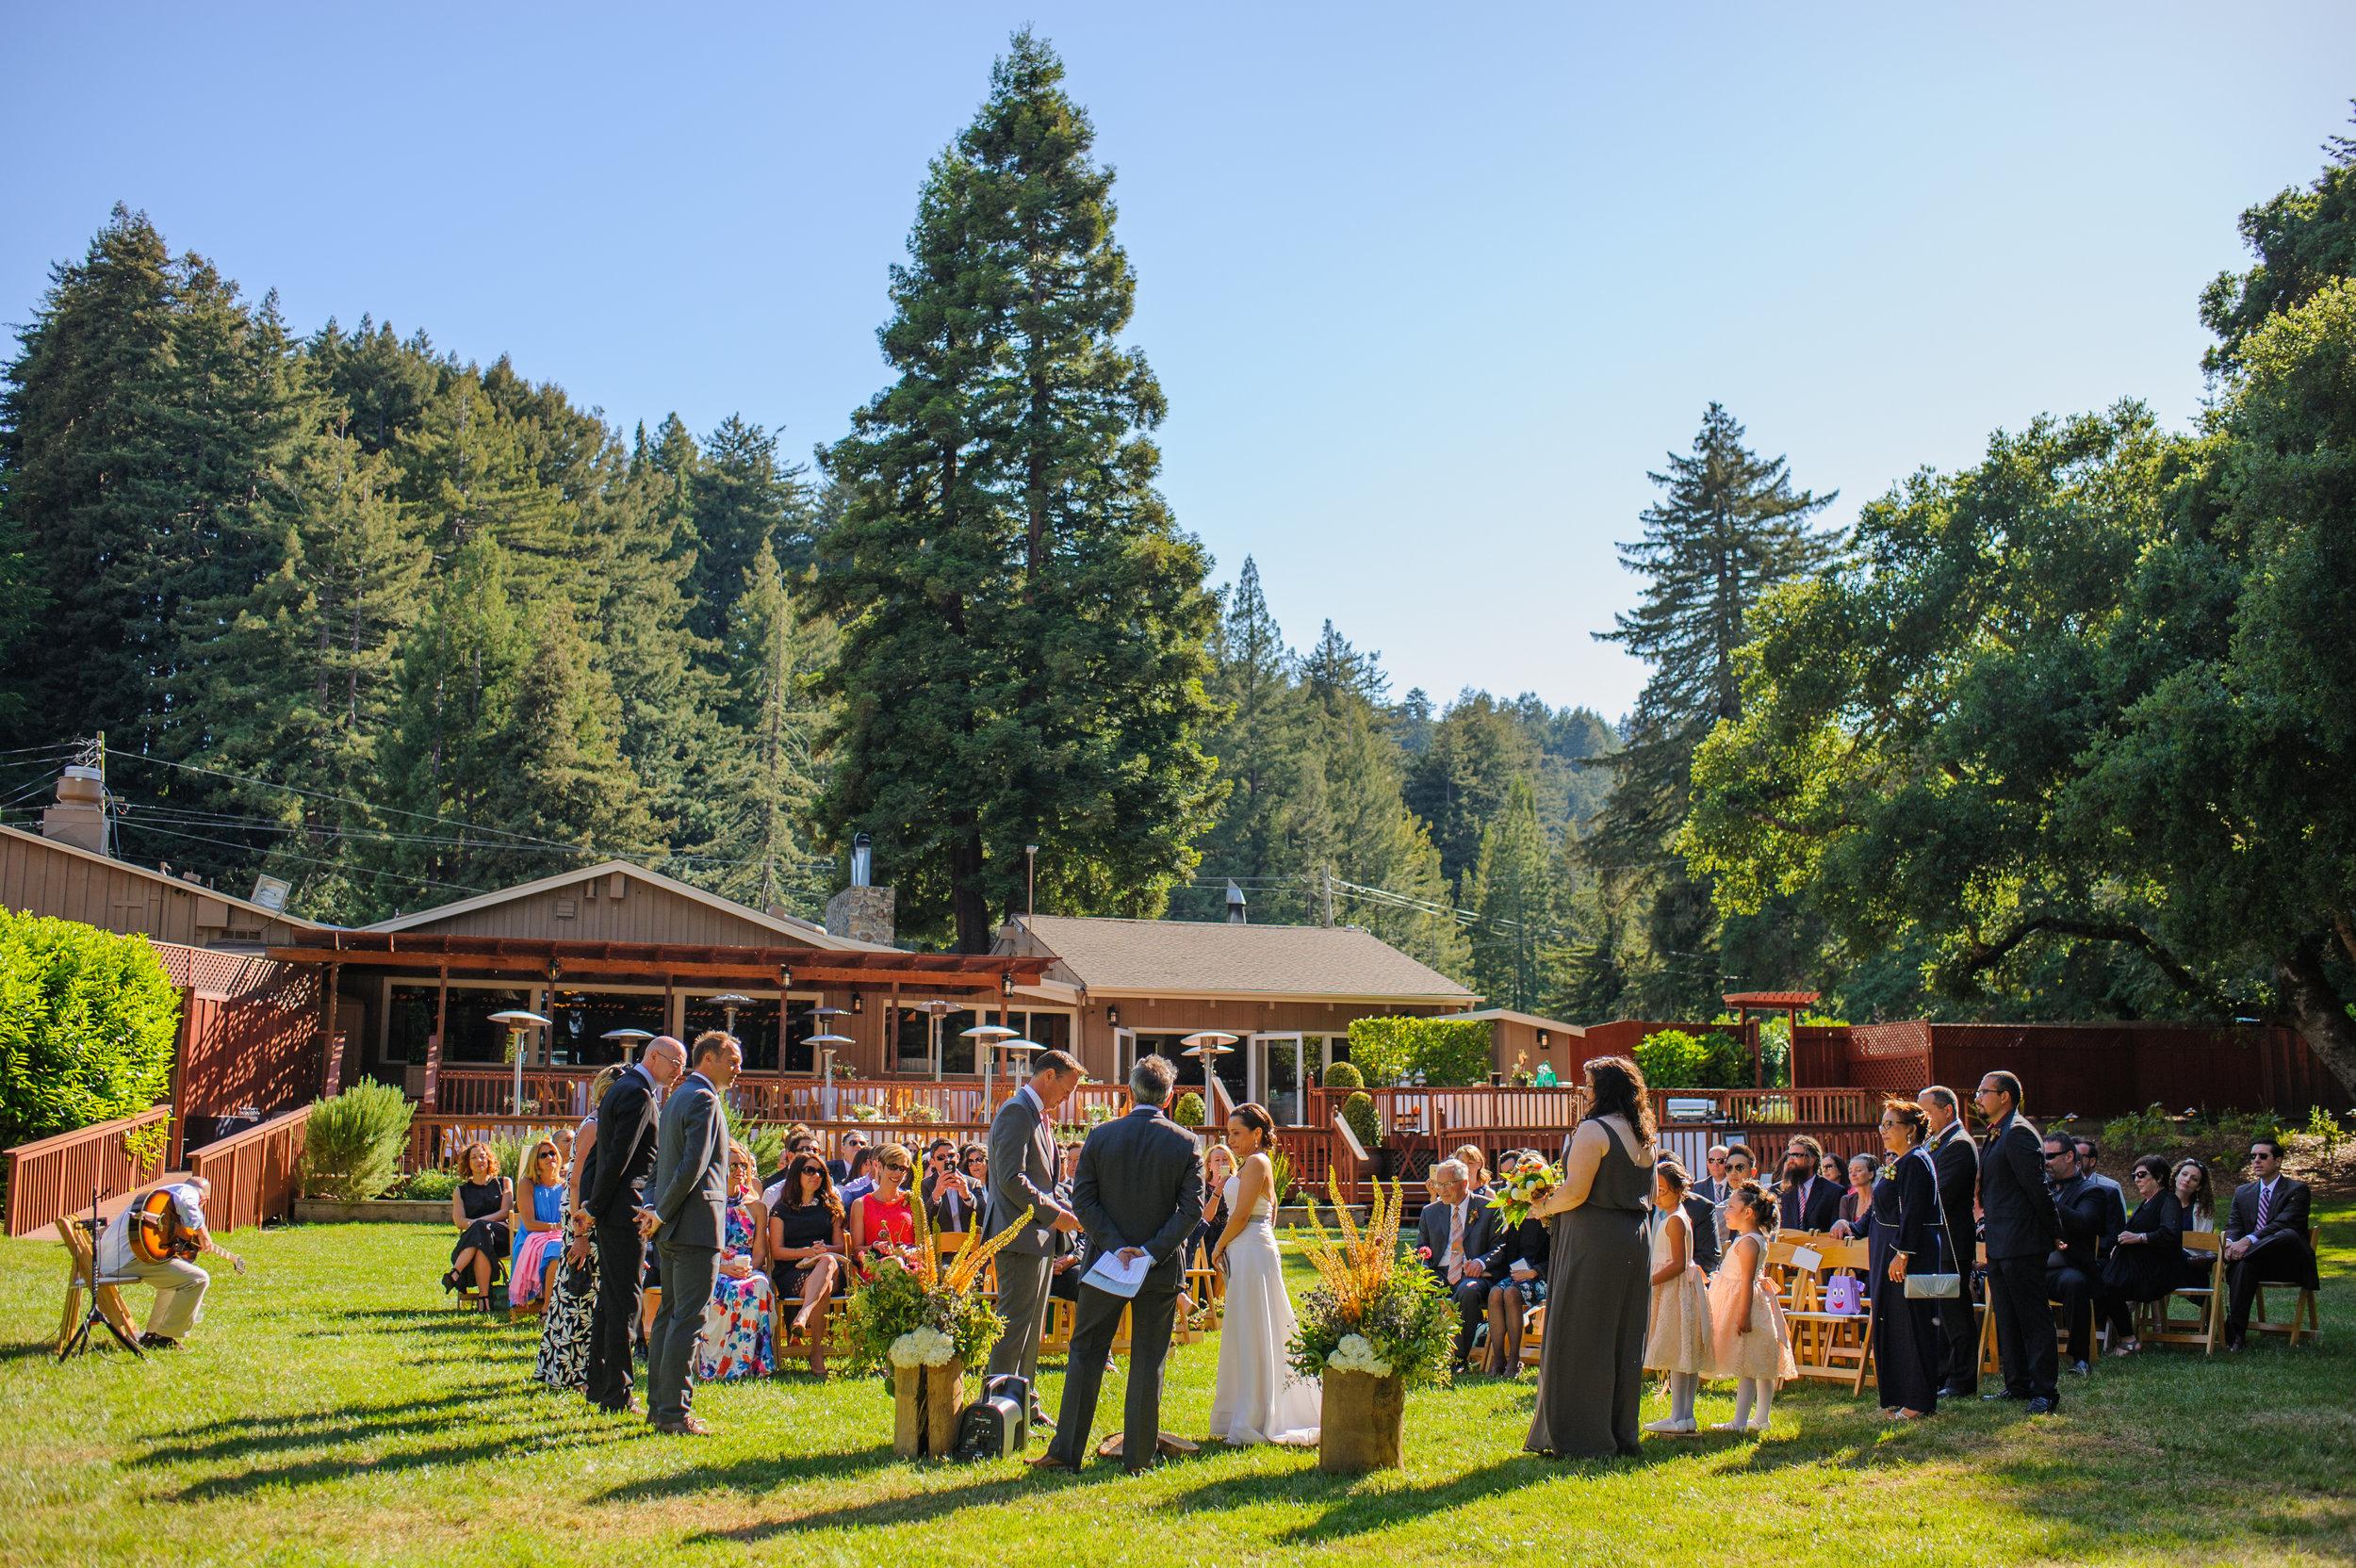 janet-jeremy-019-mountain-terrace-woodside-wedding-photographer-katherine-nicole-photography.JPG